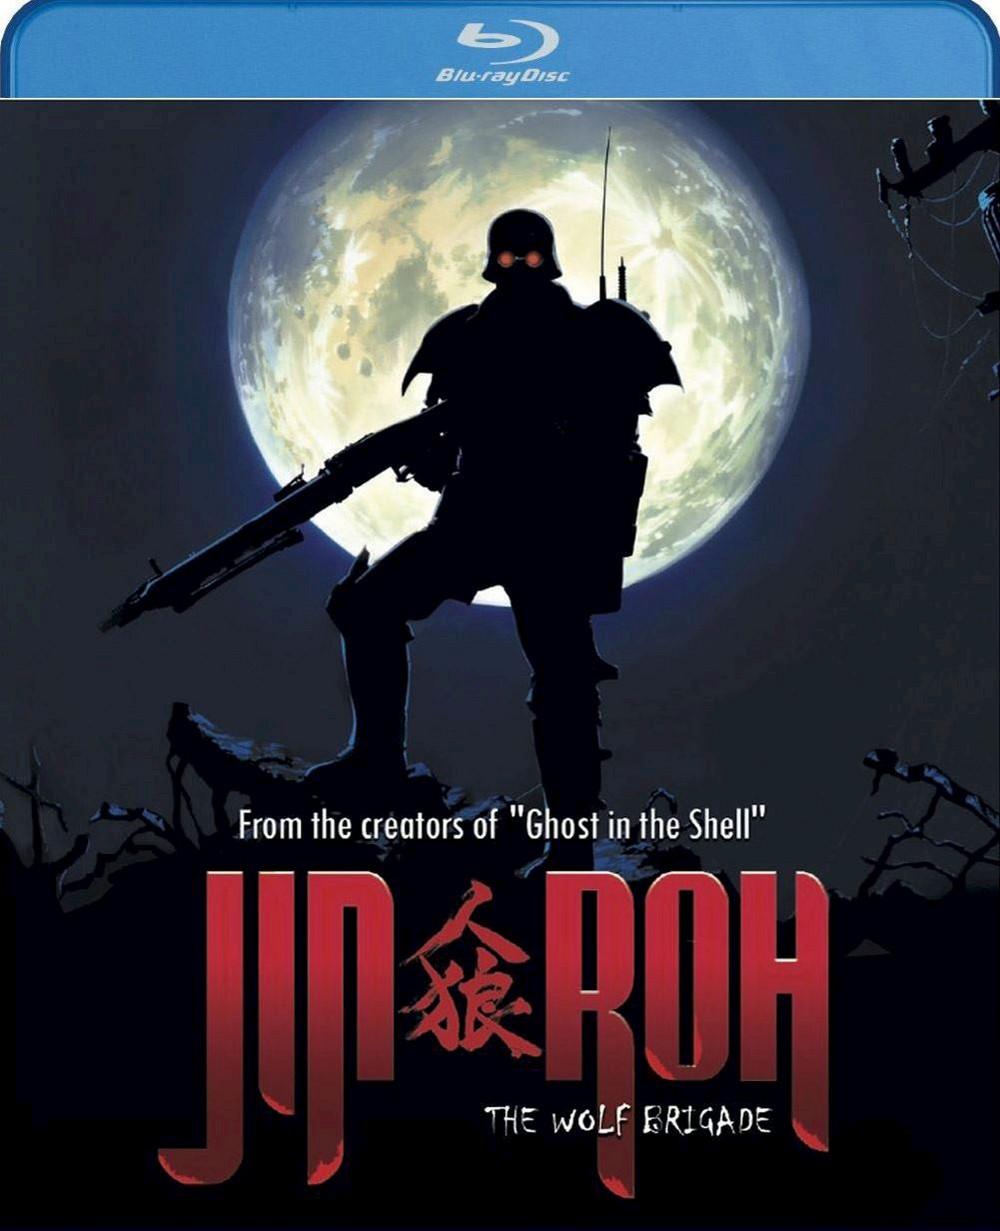 Jin roh:Wolf brigade (Blu-ray)